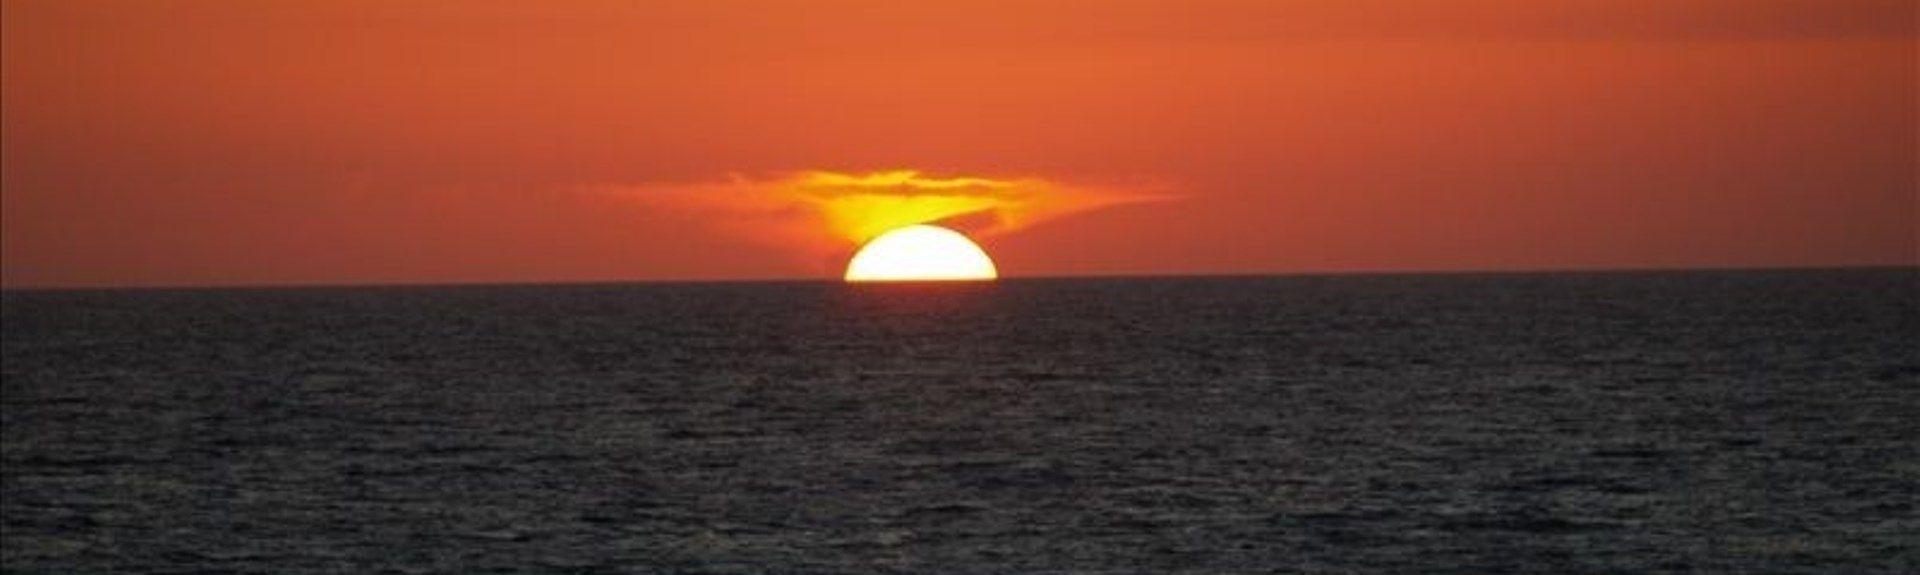 Summerlin (Okaloosa Island, Floride, États-Unis d'Amérique)